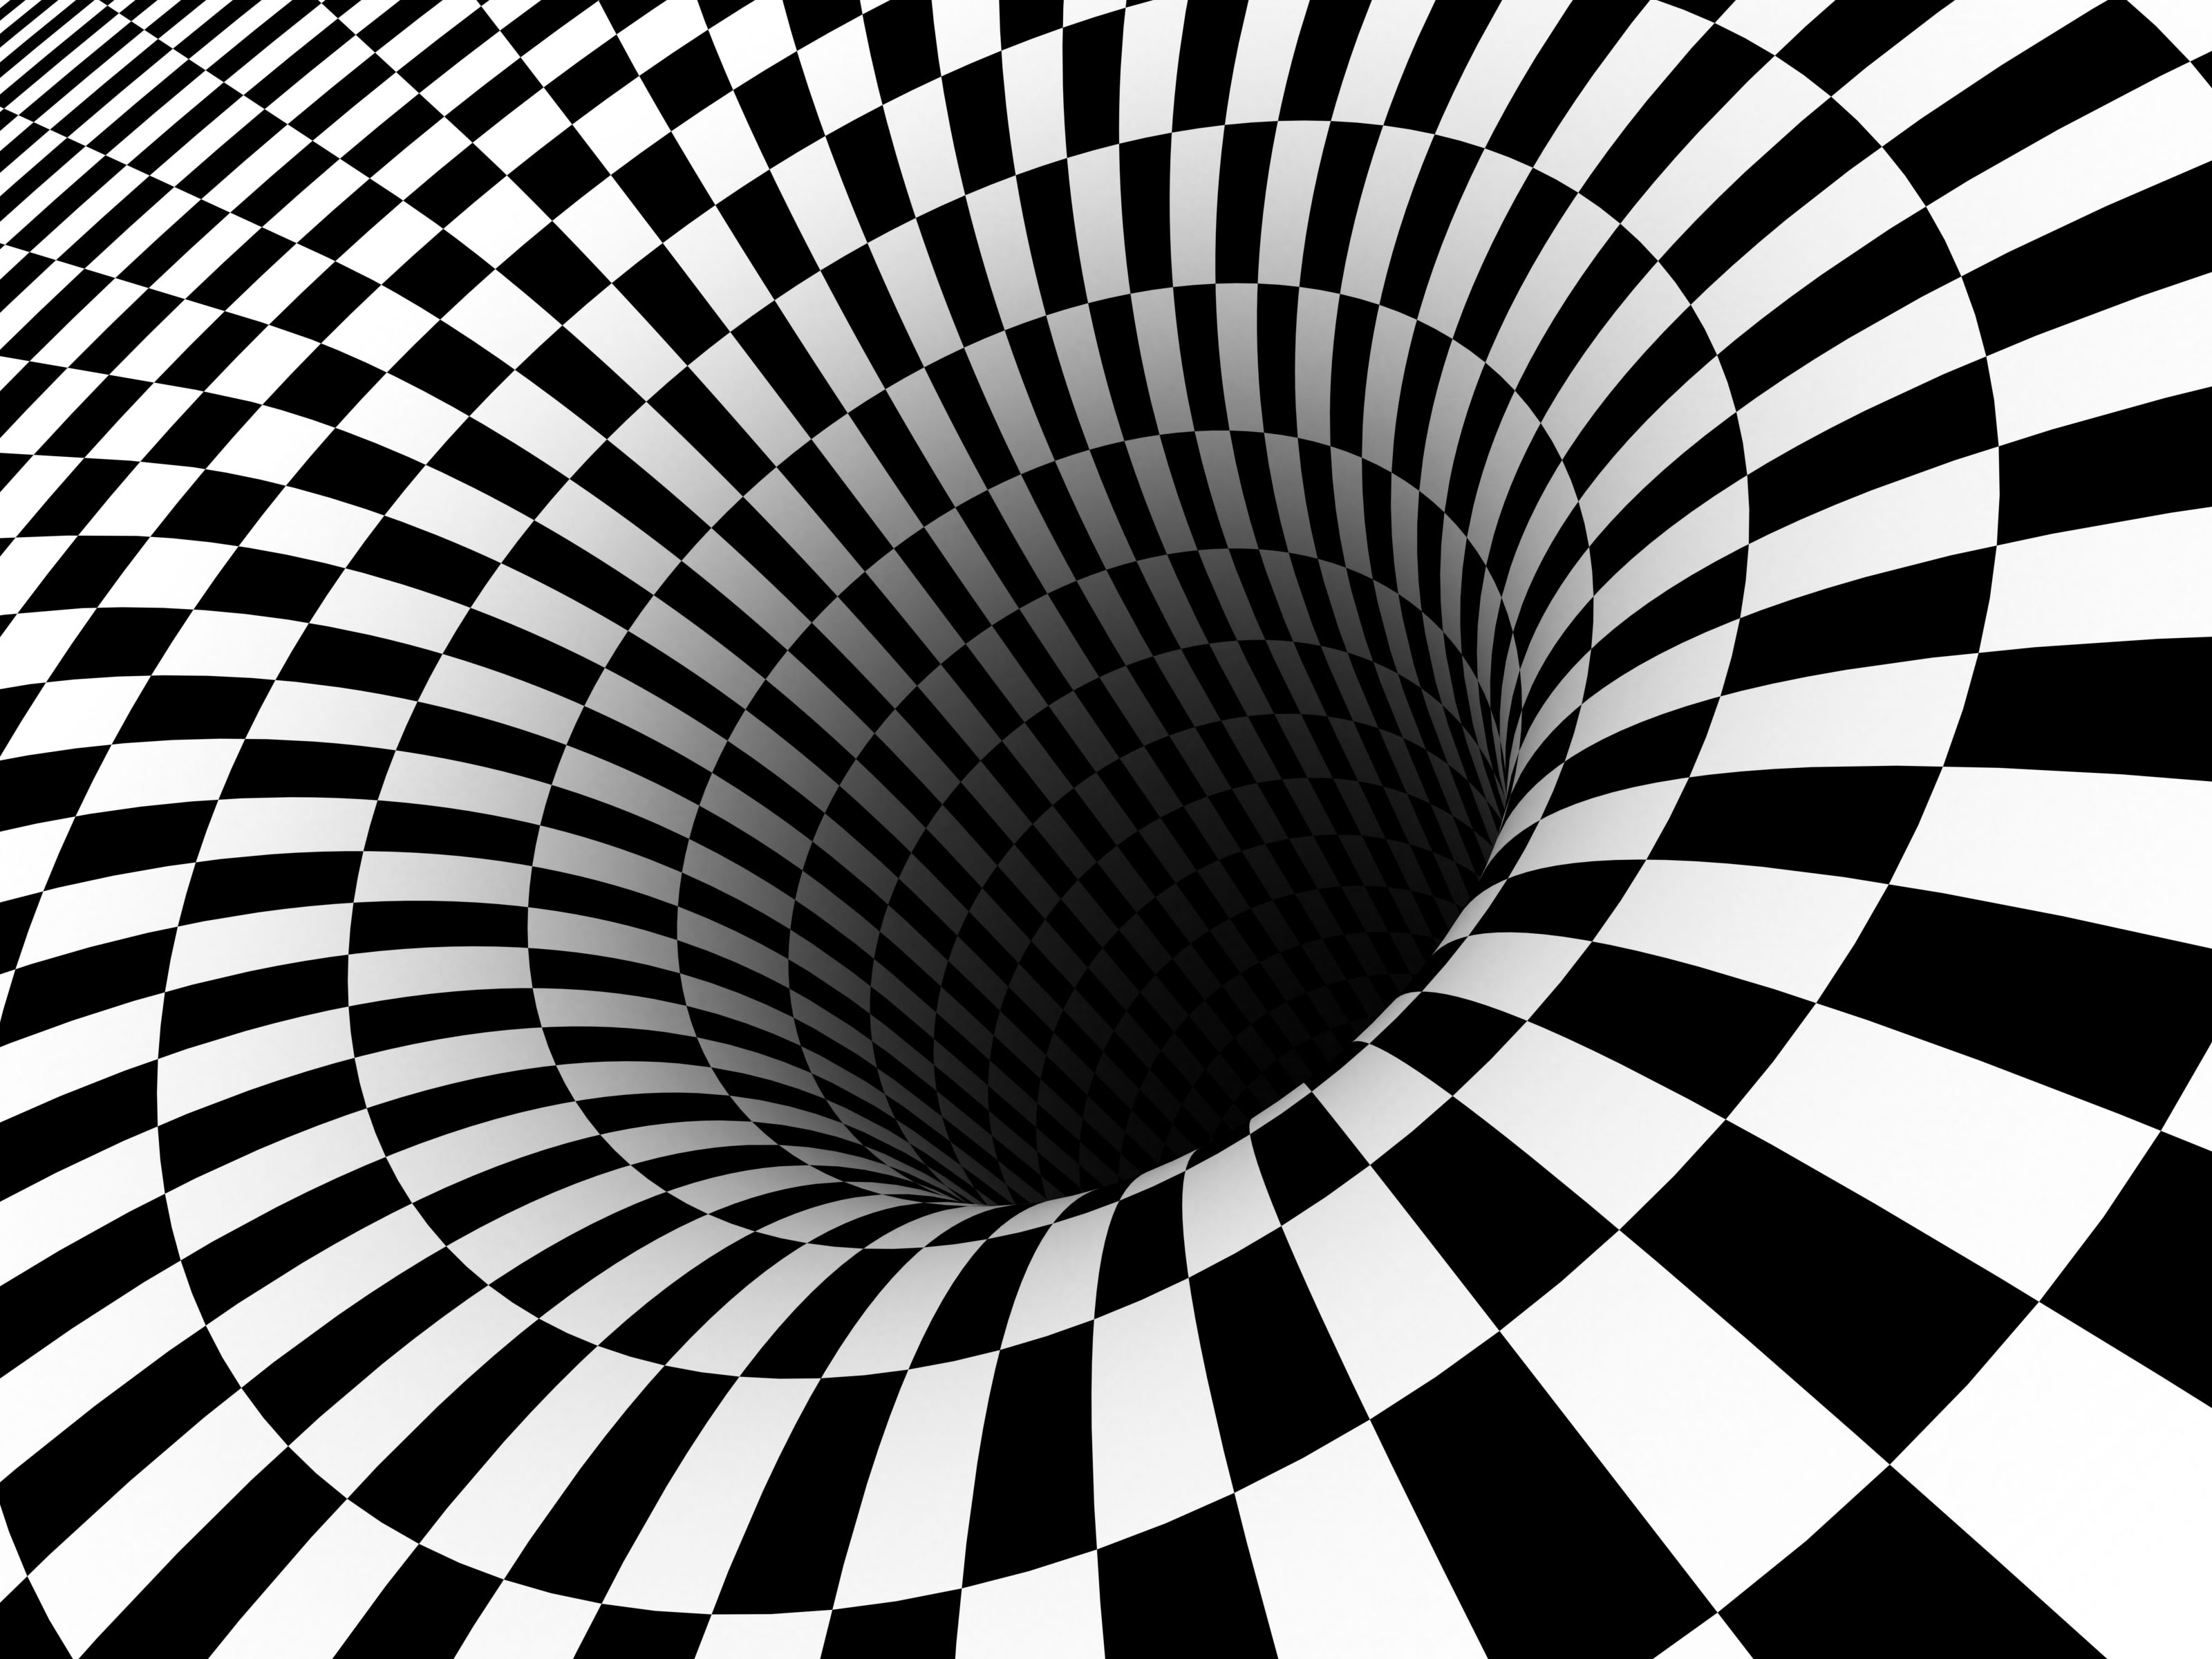 3D Illusions Wallpaper HD wallpaper background 3200x2400